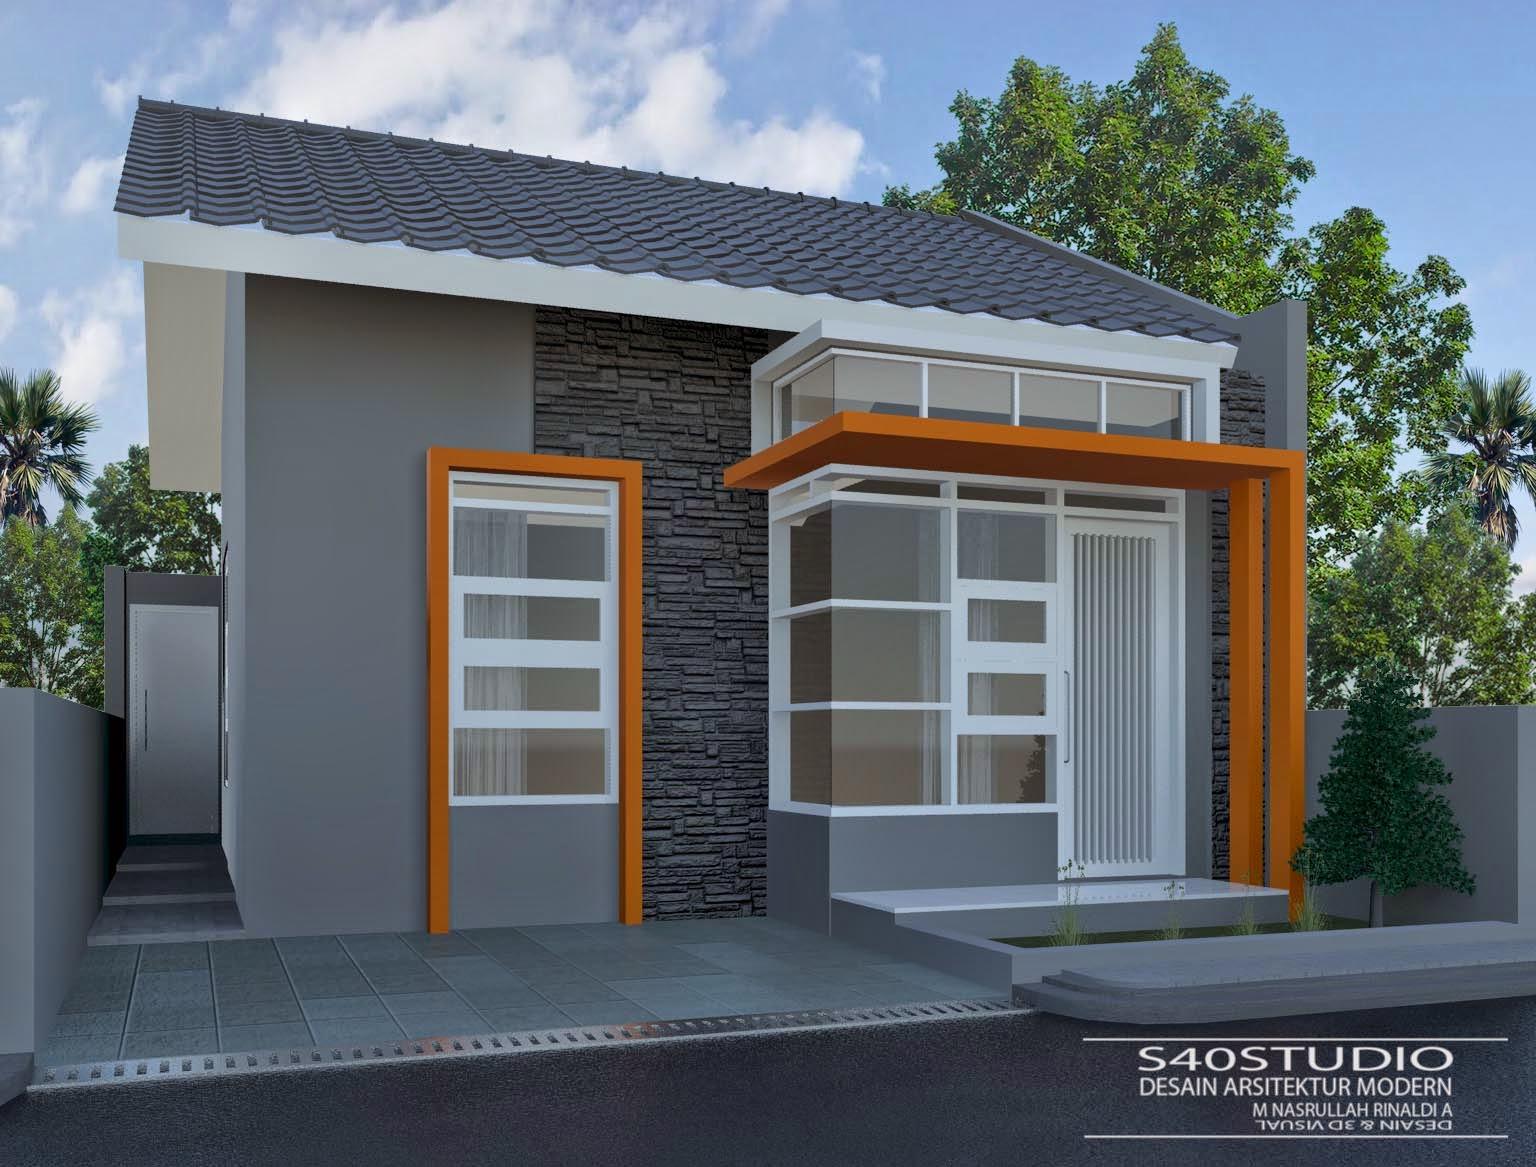 55 Gambar Rumah Minimalis Modern Lengkap HD Terbaru